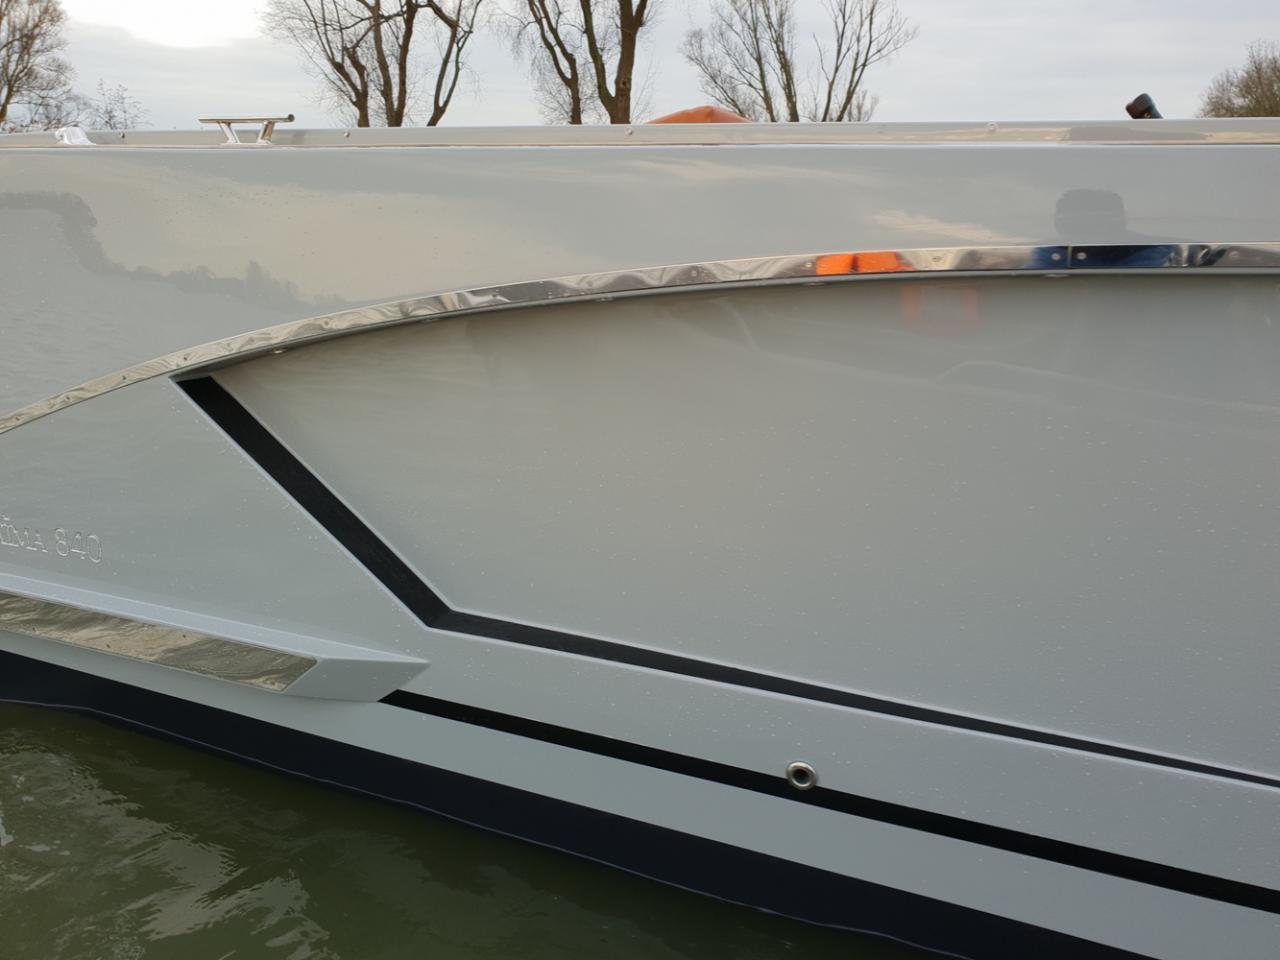 Maxima 840 tender 50